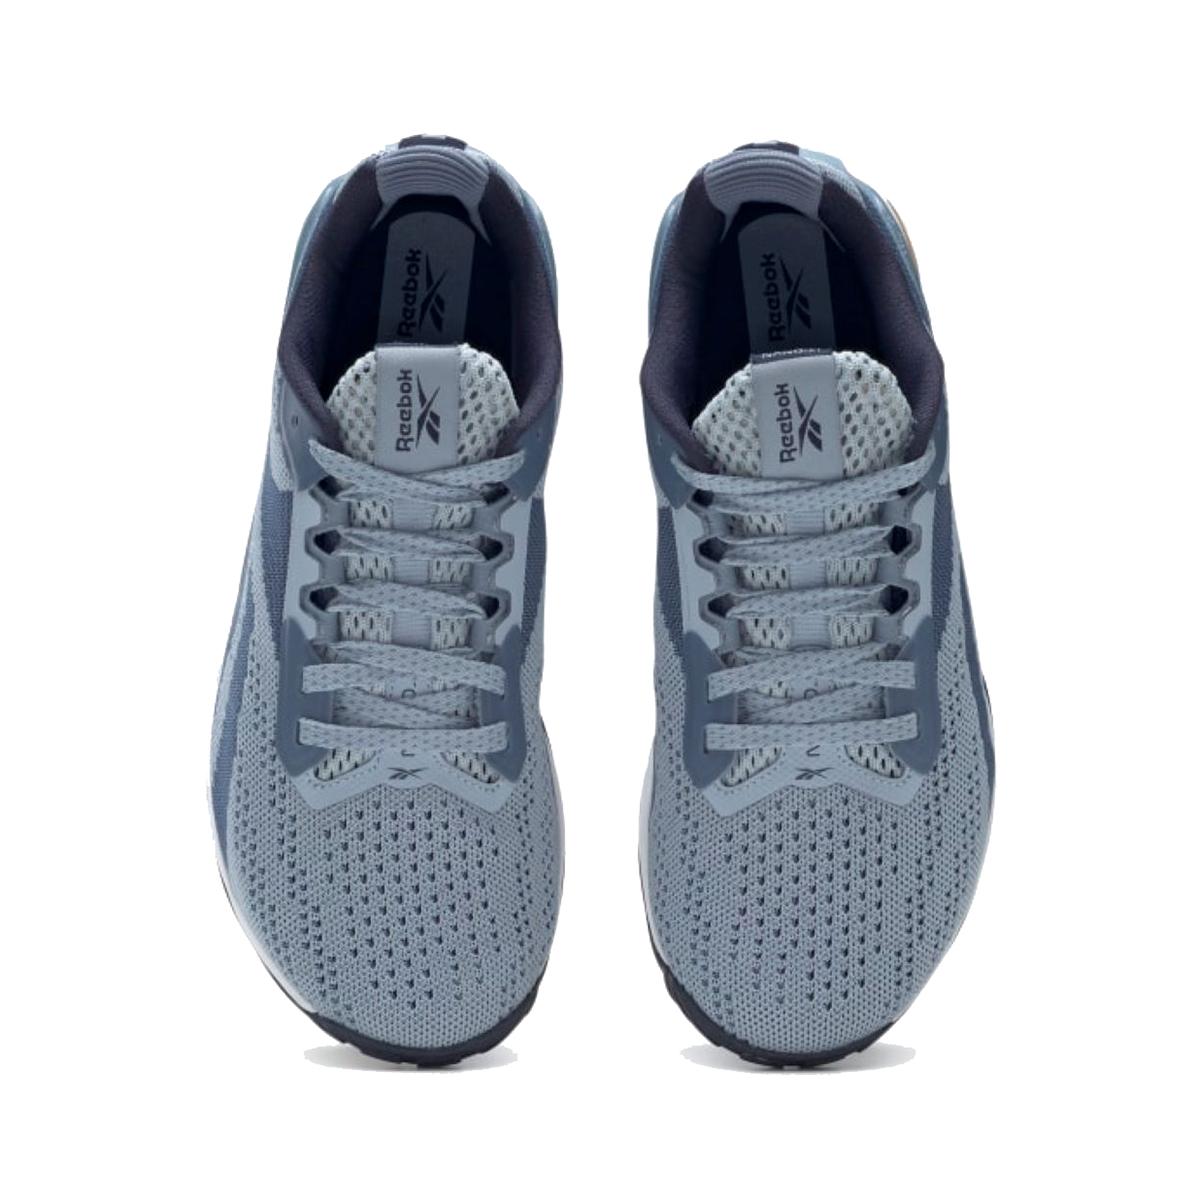 Women's Reebok Nano X1 Training Shoe - Color: Gable Grey/Blue Slate/Vector Navy - Size: 5 - Width: Regular, Gable Grey/Blue Slate/Vector Navy, large, image 3